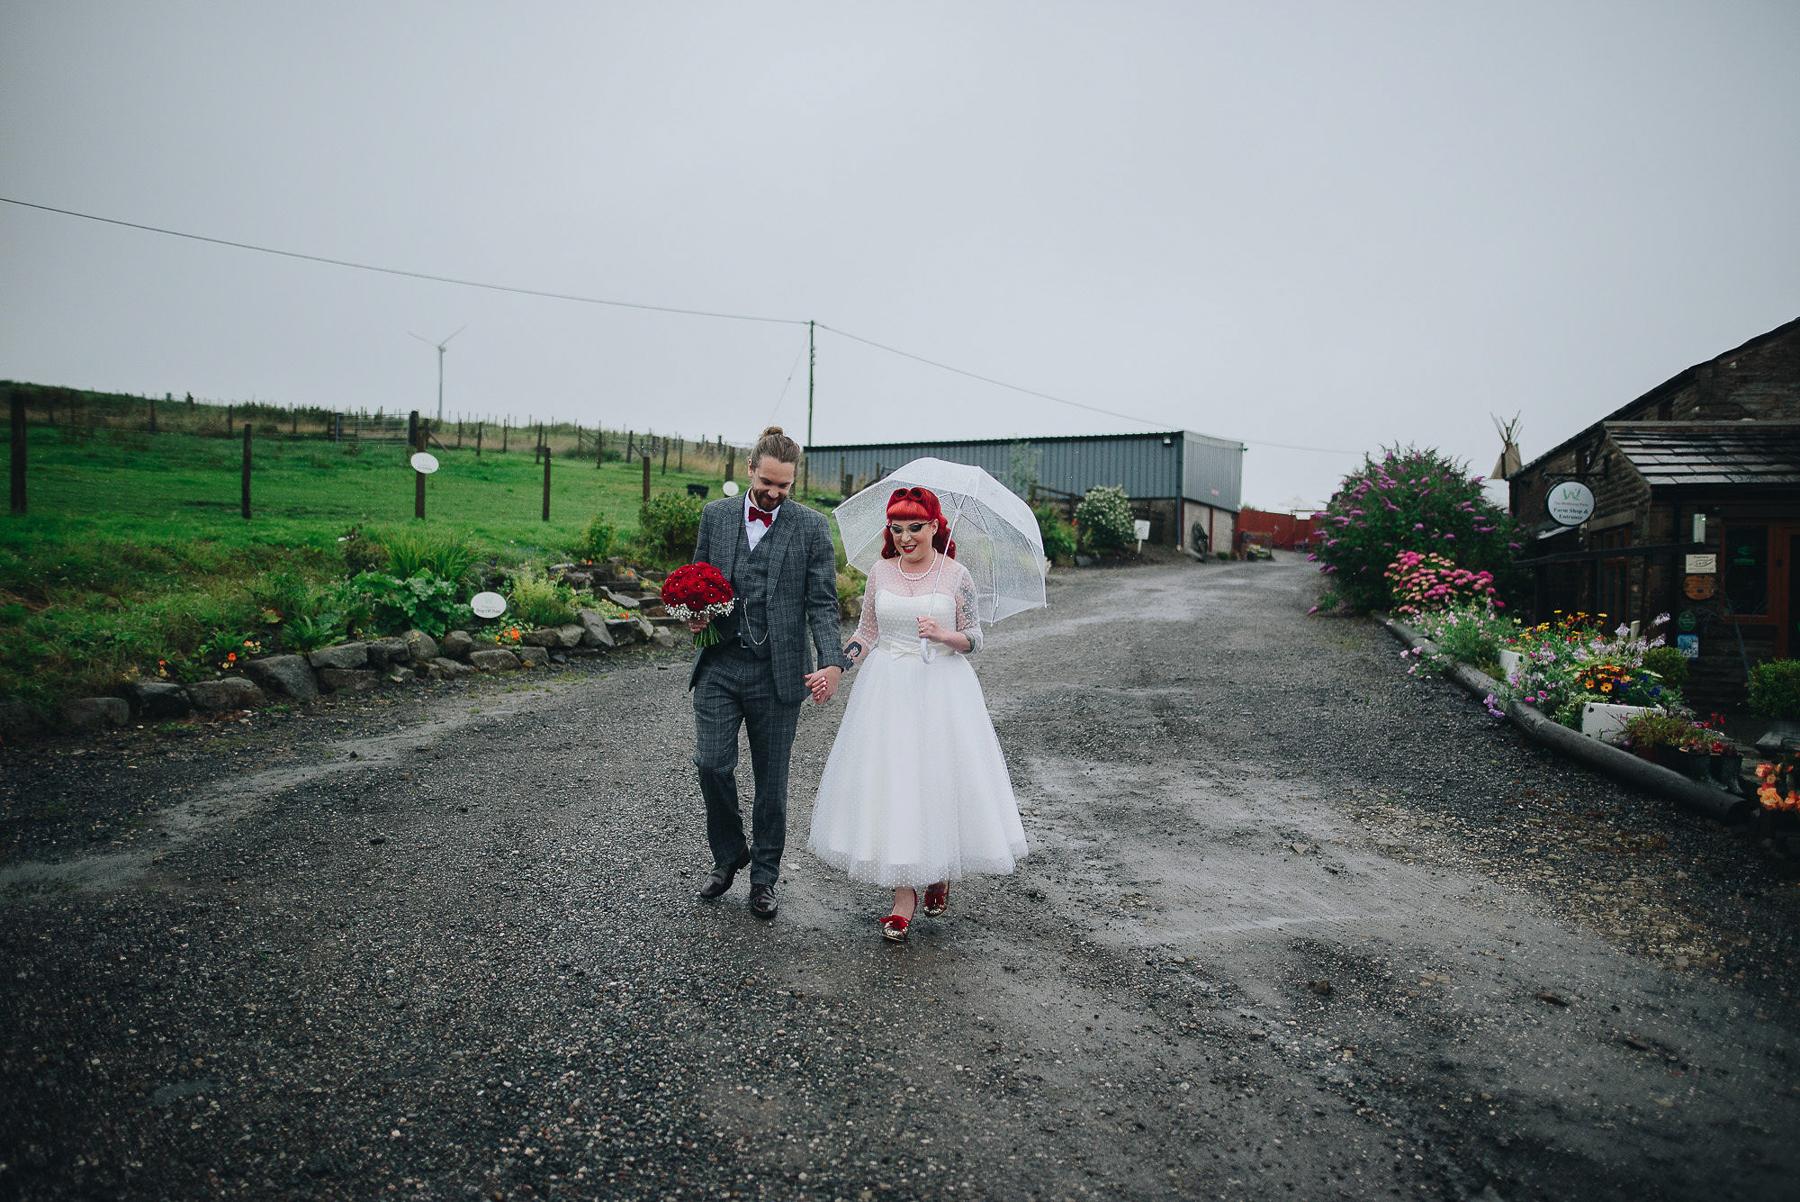 Wellbeing_Farm_Wedding_Photography_The_Pin-Up_Bride_Lara_Shaun-95.jpg